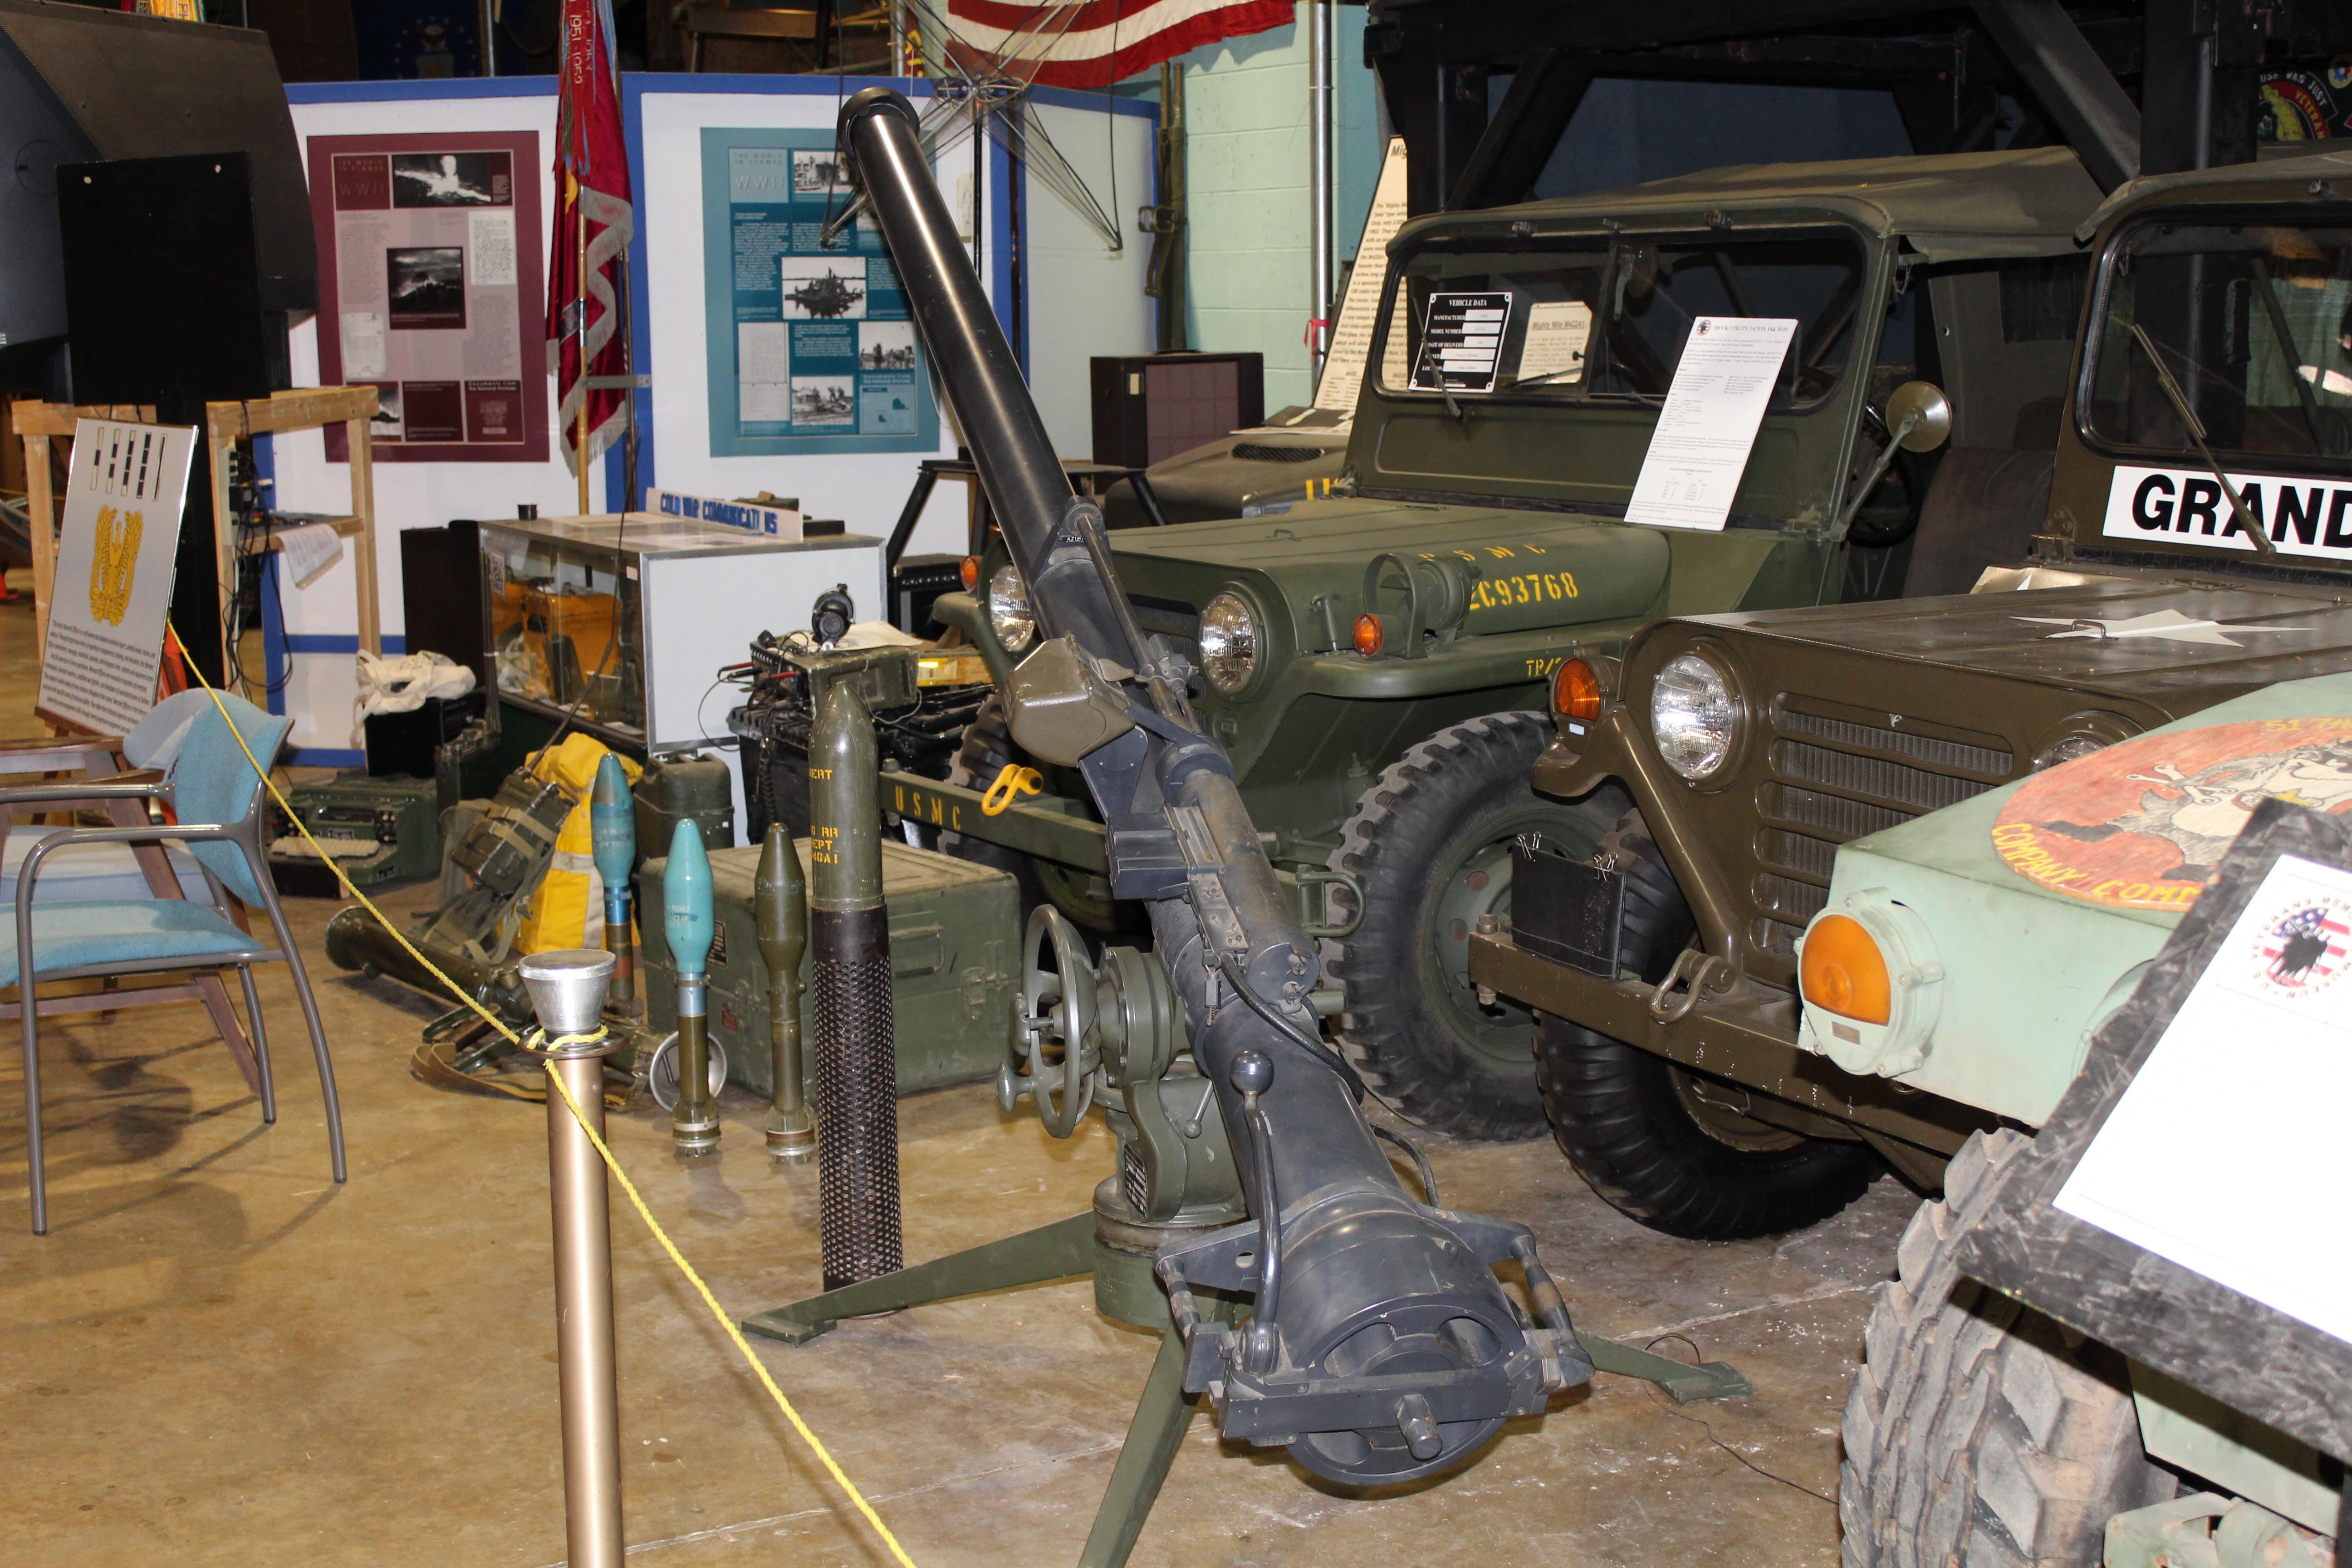 106 mm M40A Recoilless Rifle